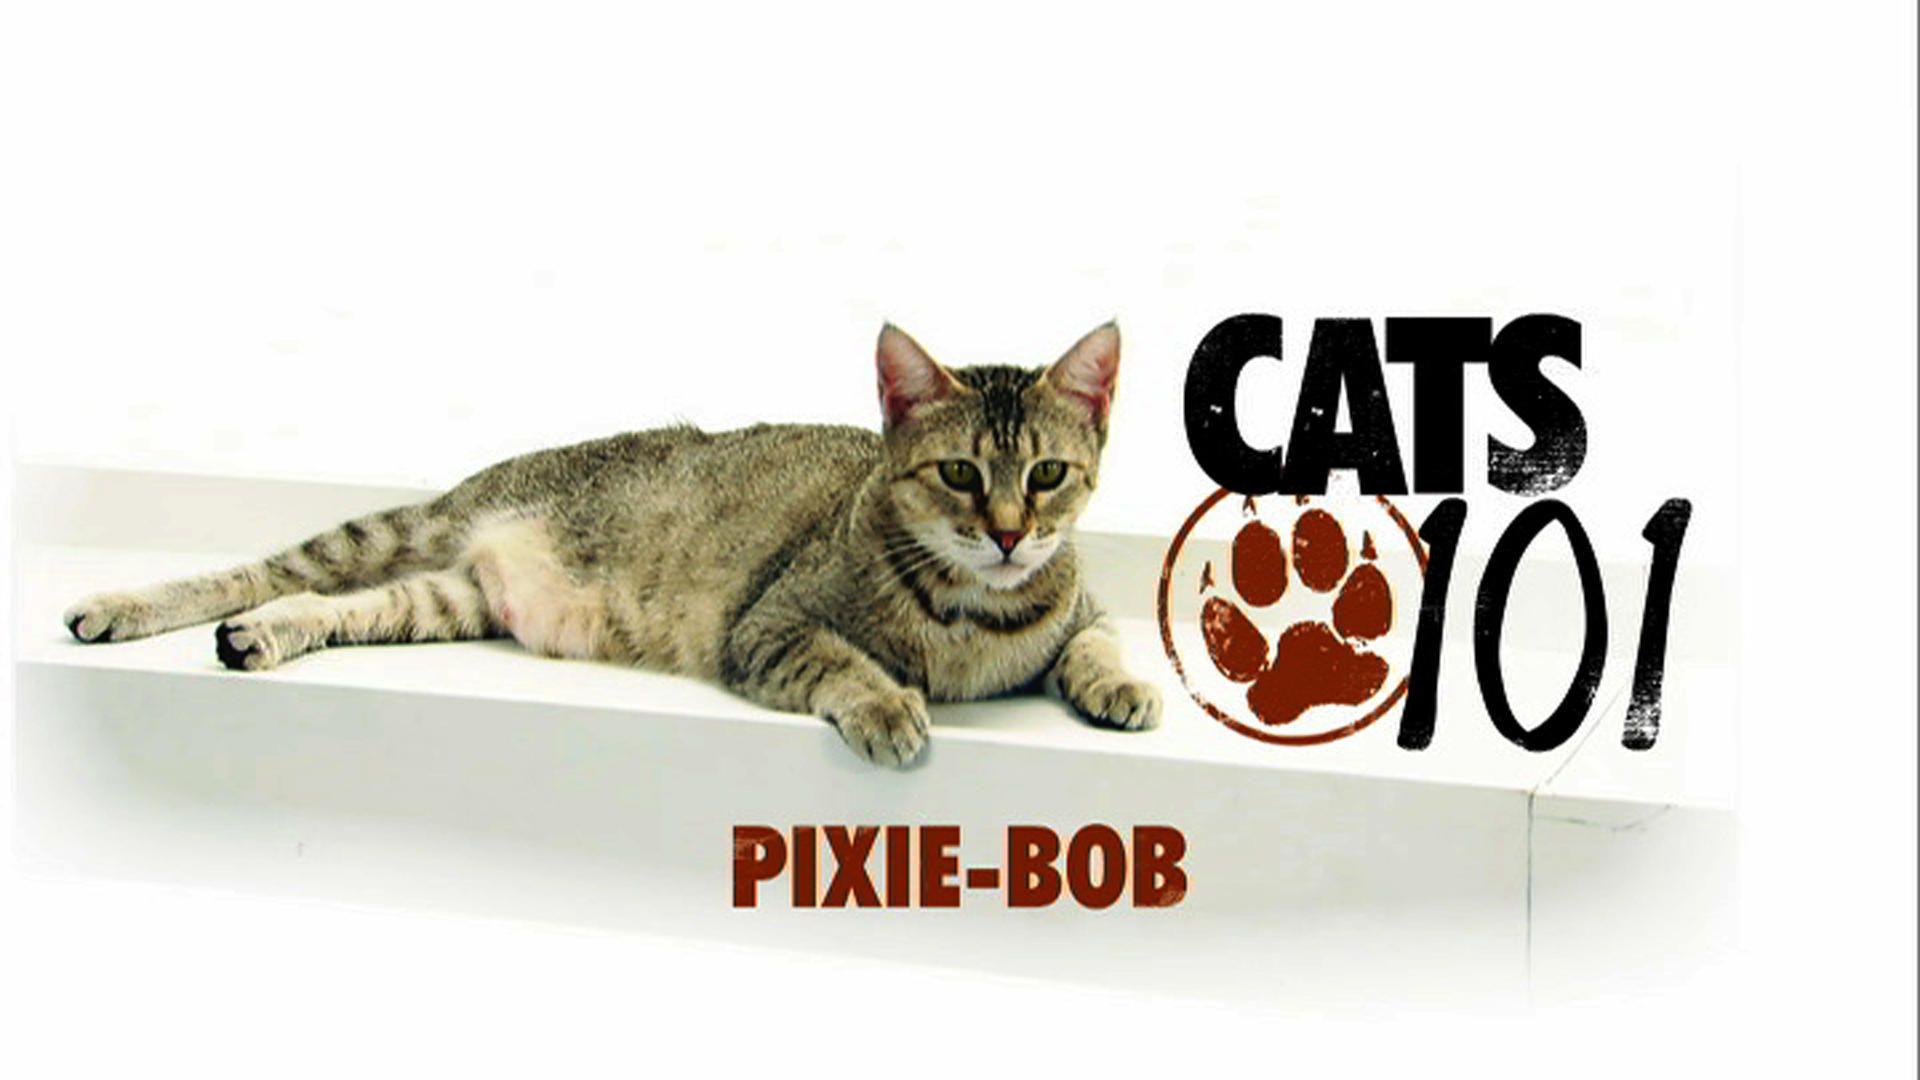 Pixie Bob Cats, Pixie bob cats, Pixie bob